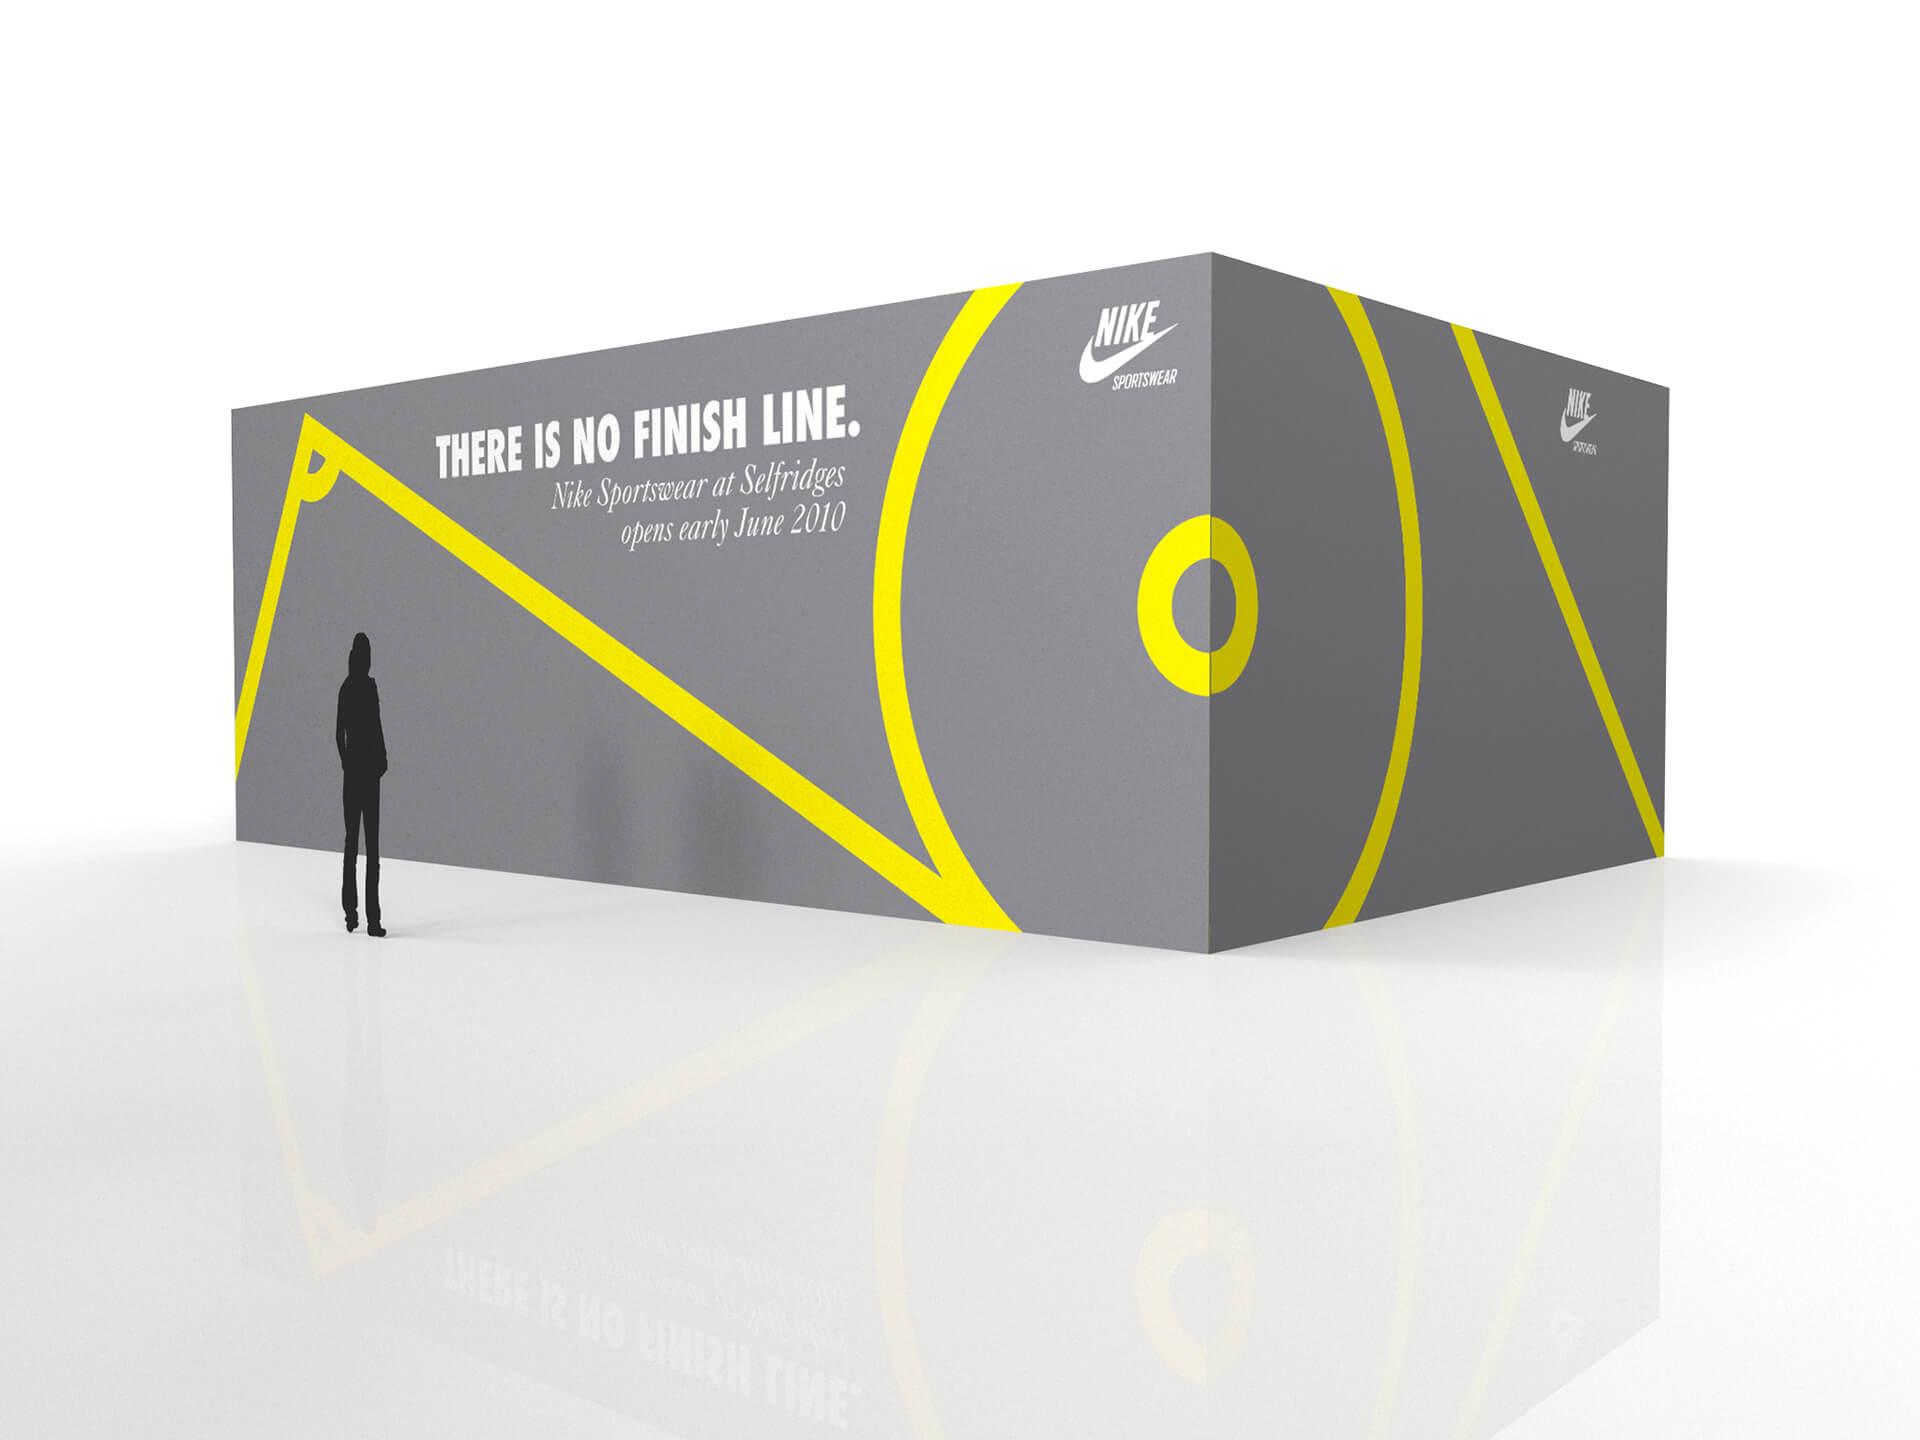 Nike Selfridges 1920px 02